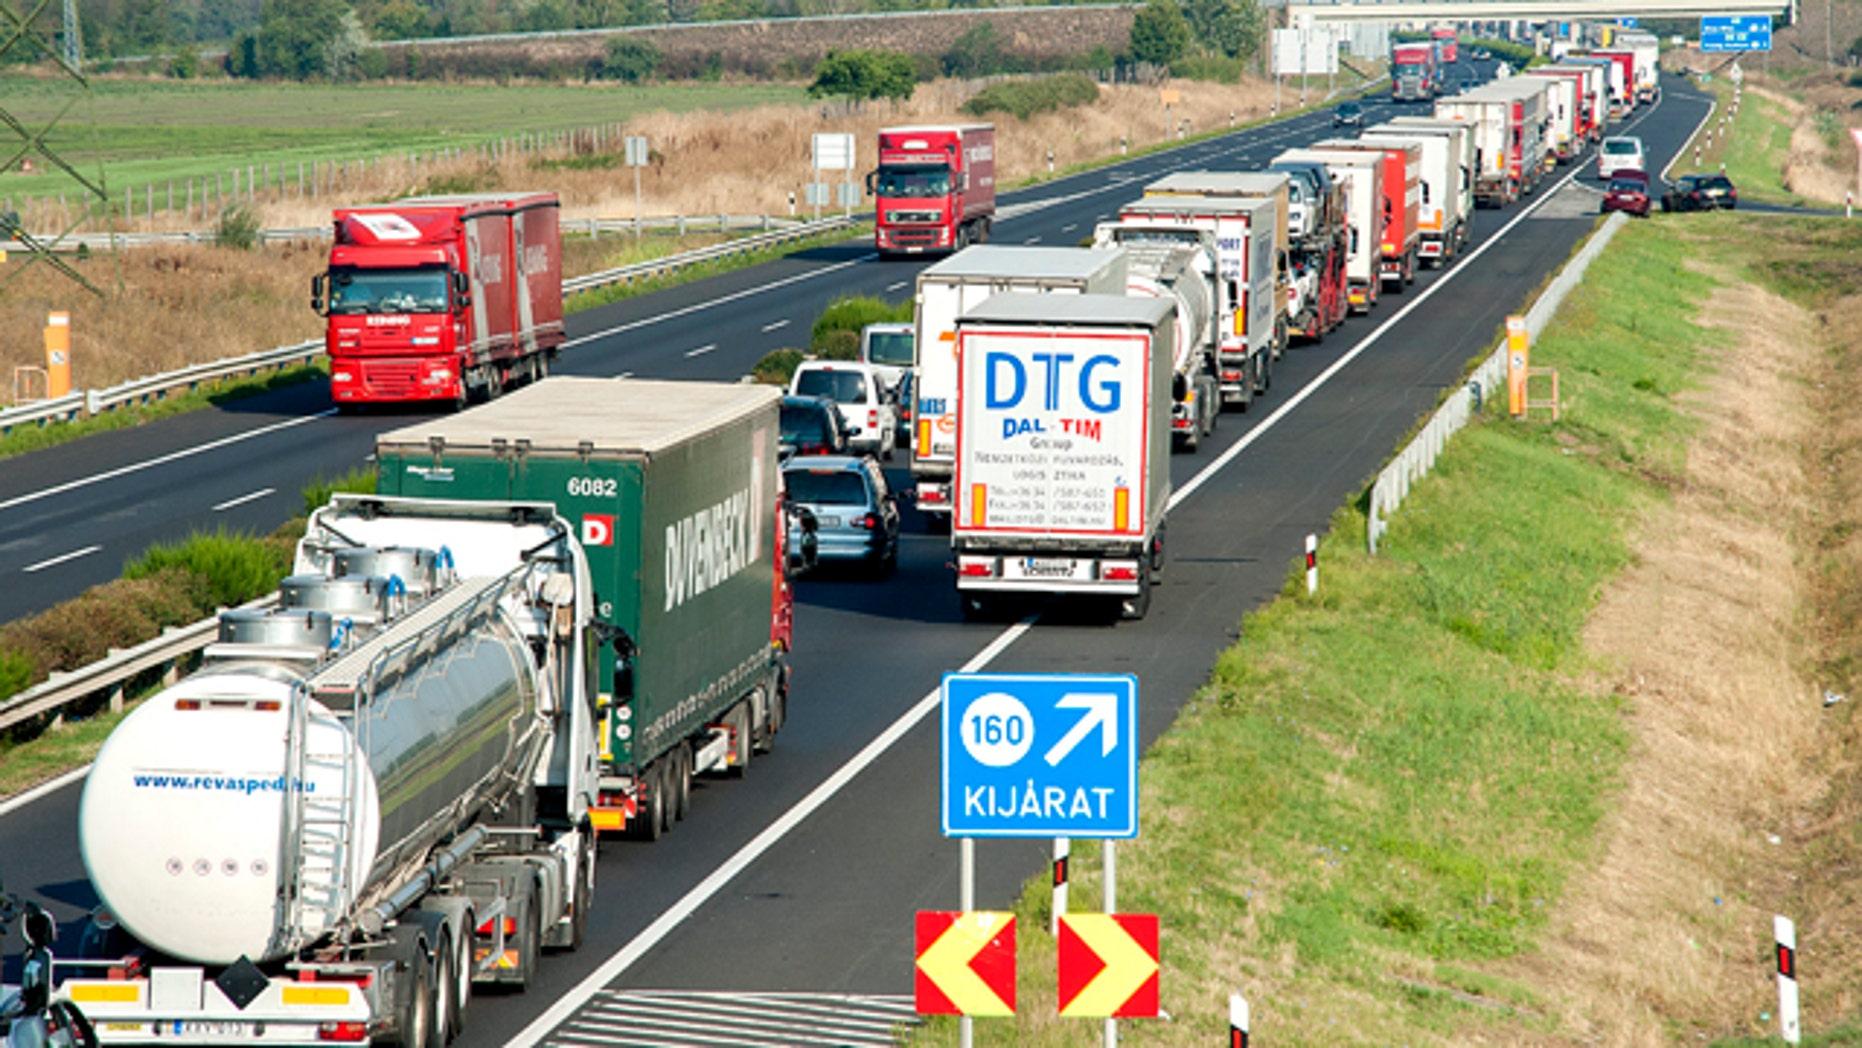 Aug. 31, 2015: A long queue of vehicles  waits  on the M1 motorway near the border between Hungary and Austria near Mosonmagyarovar, 158 km northwest from Budapest, Hungary. (Csaba Krizsan/MTI via AP)